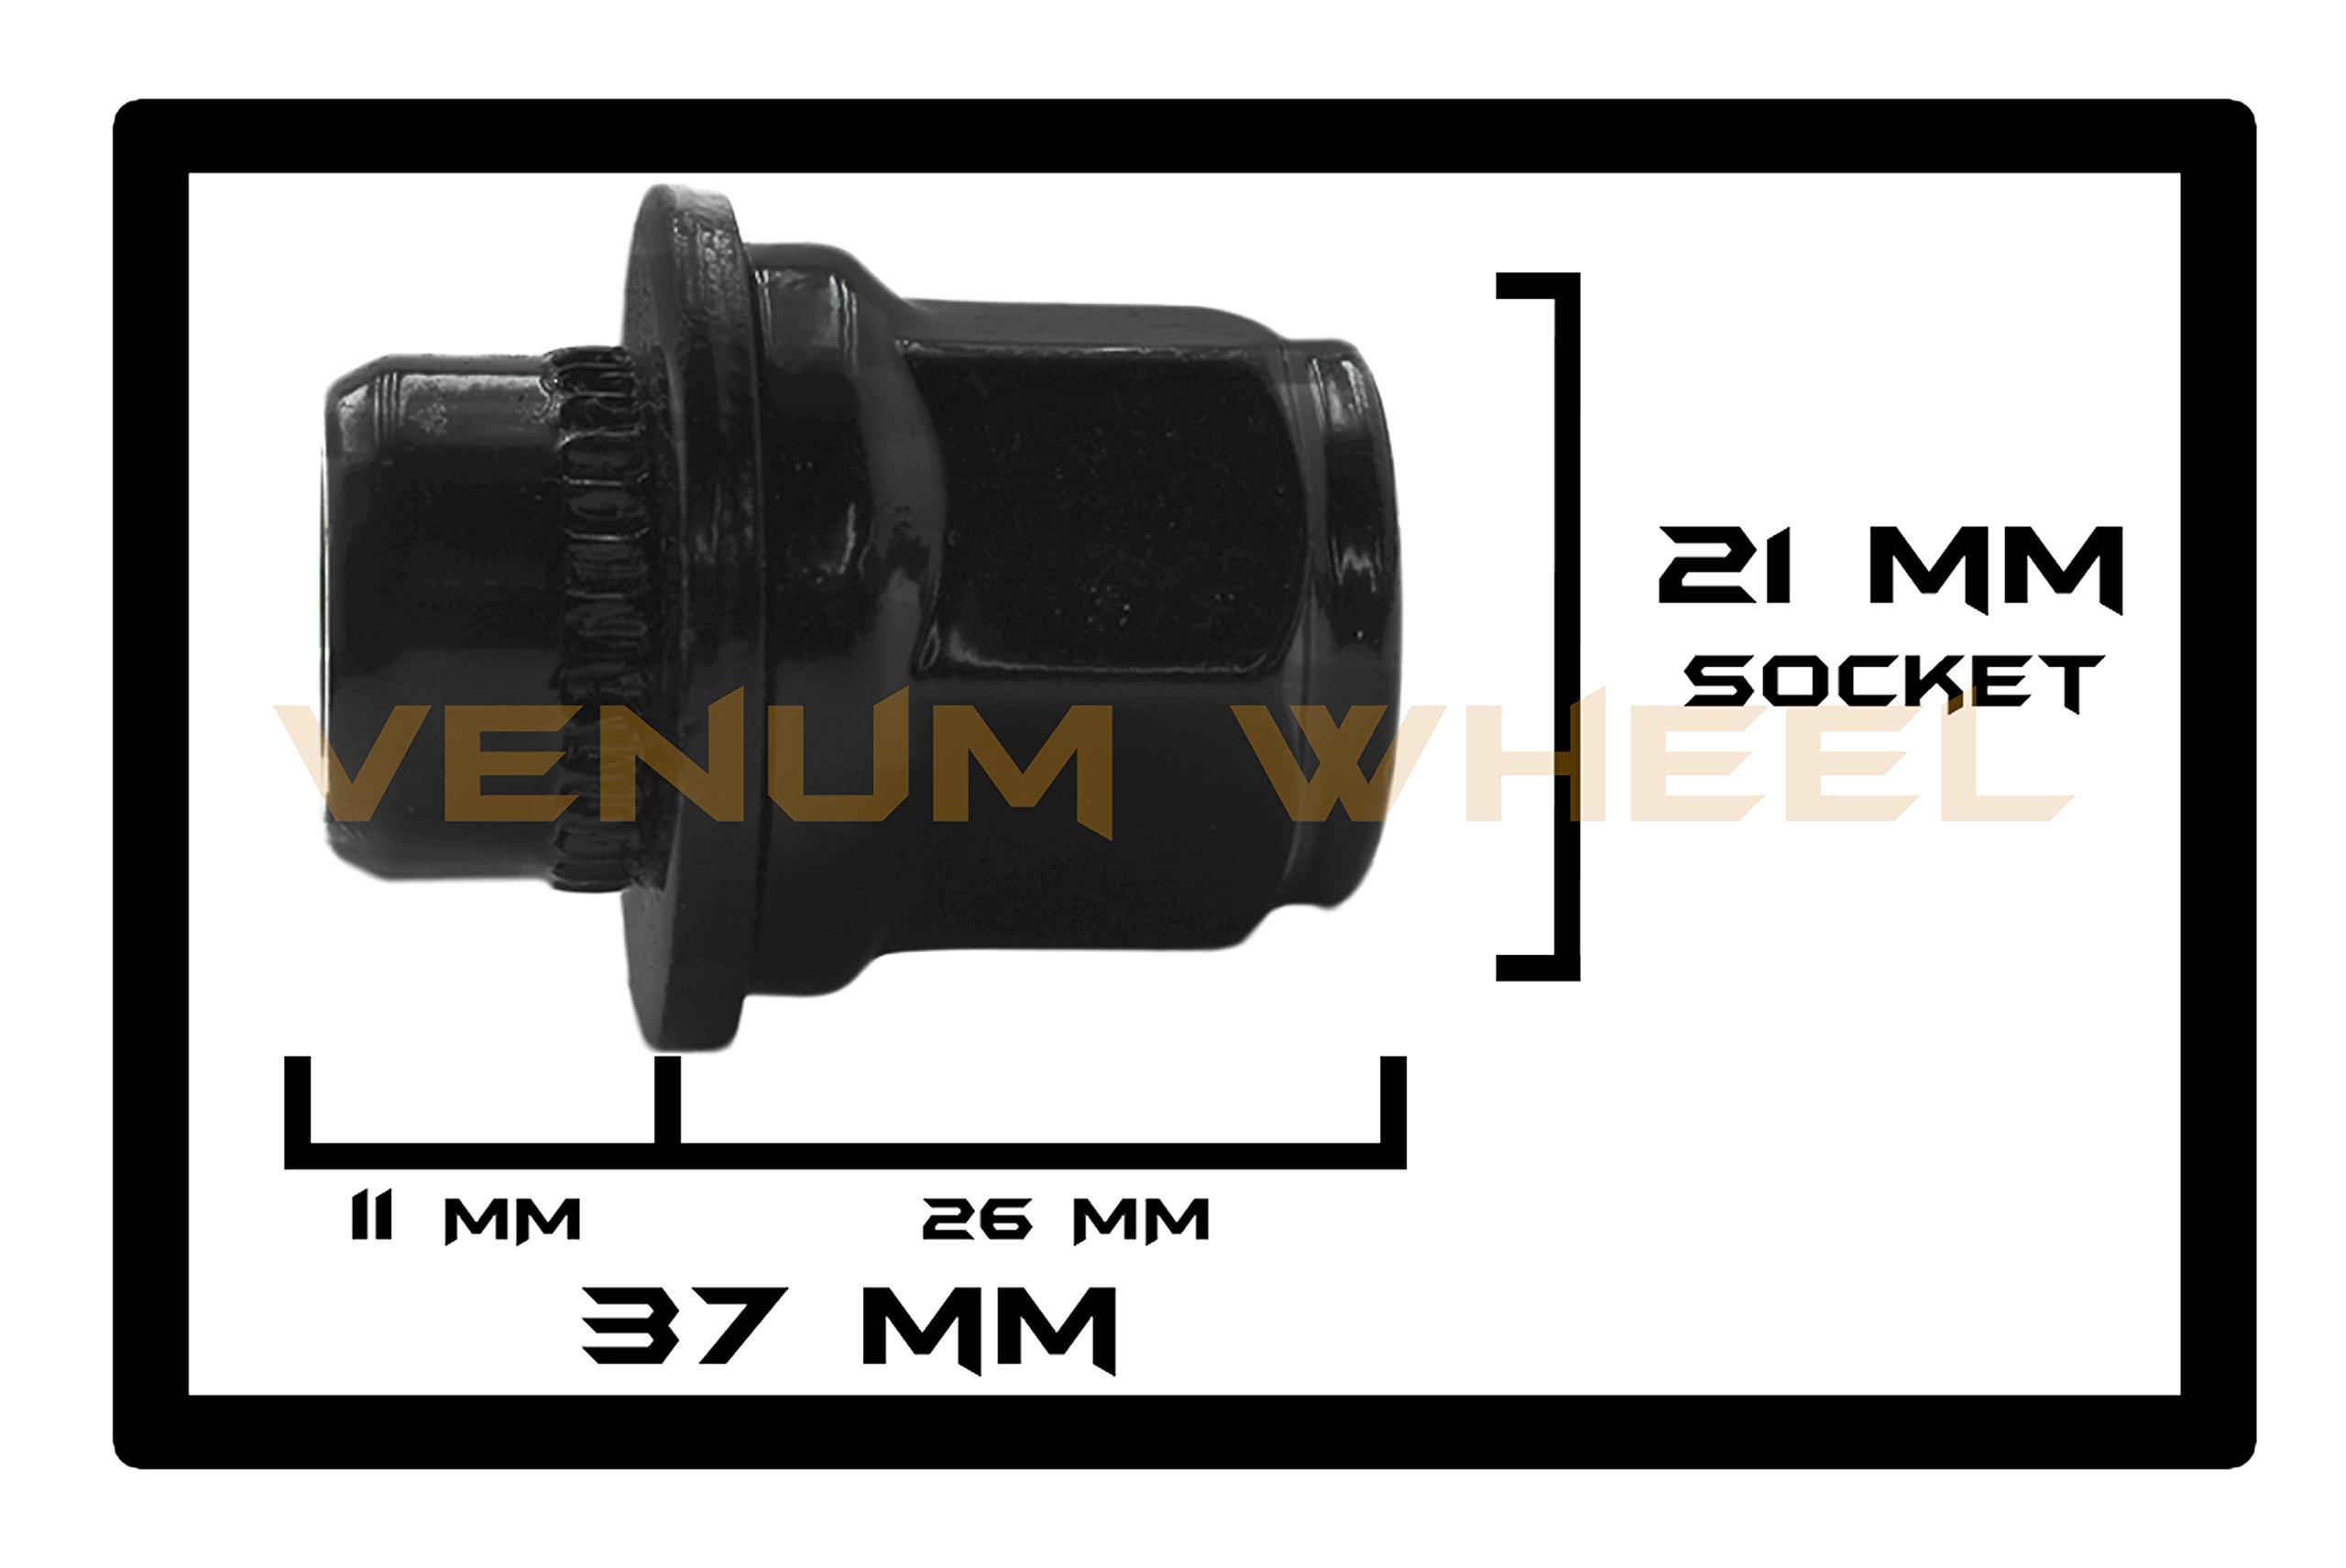 24 Pc Black Toyota Tacoma Tundra Fj Cruiser Oem Mag Seat Lug Nuts 12x1.5 1.45'' Tall 6 Lug by Venum wheel accessories (Image #2)